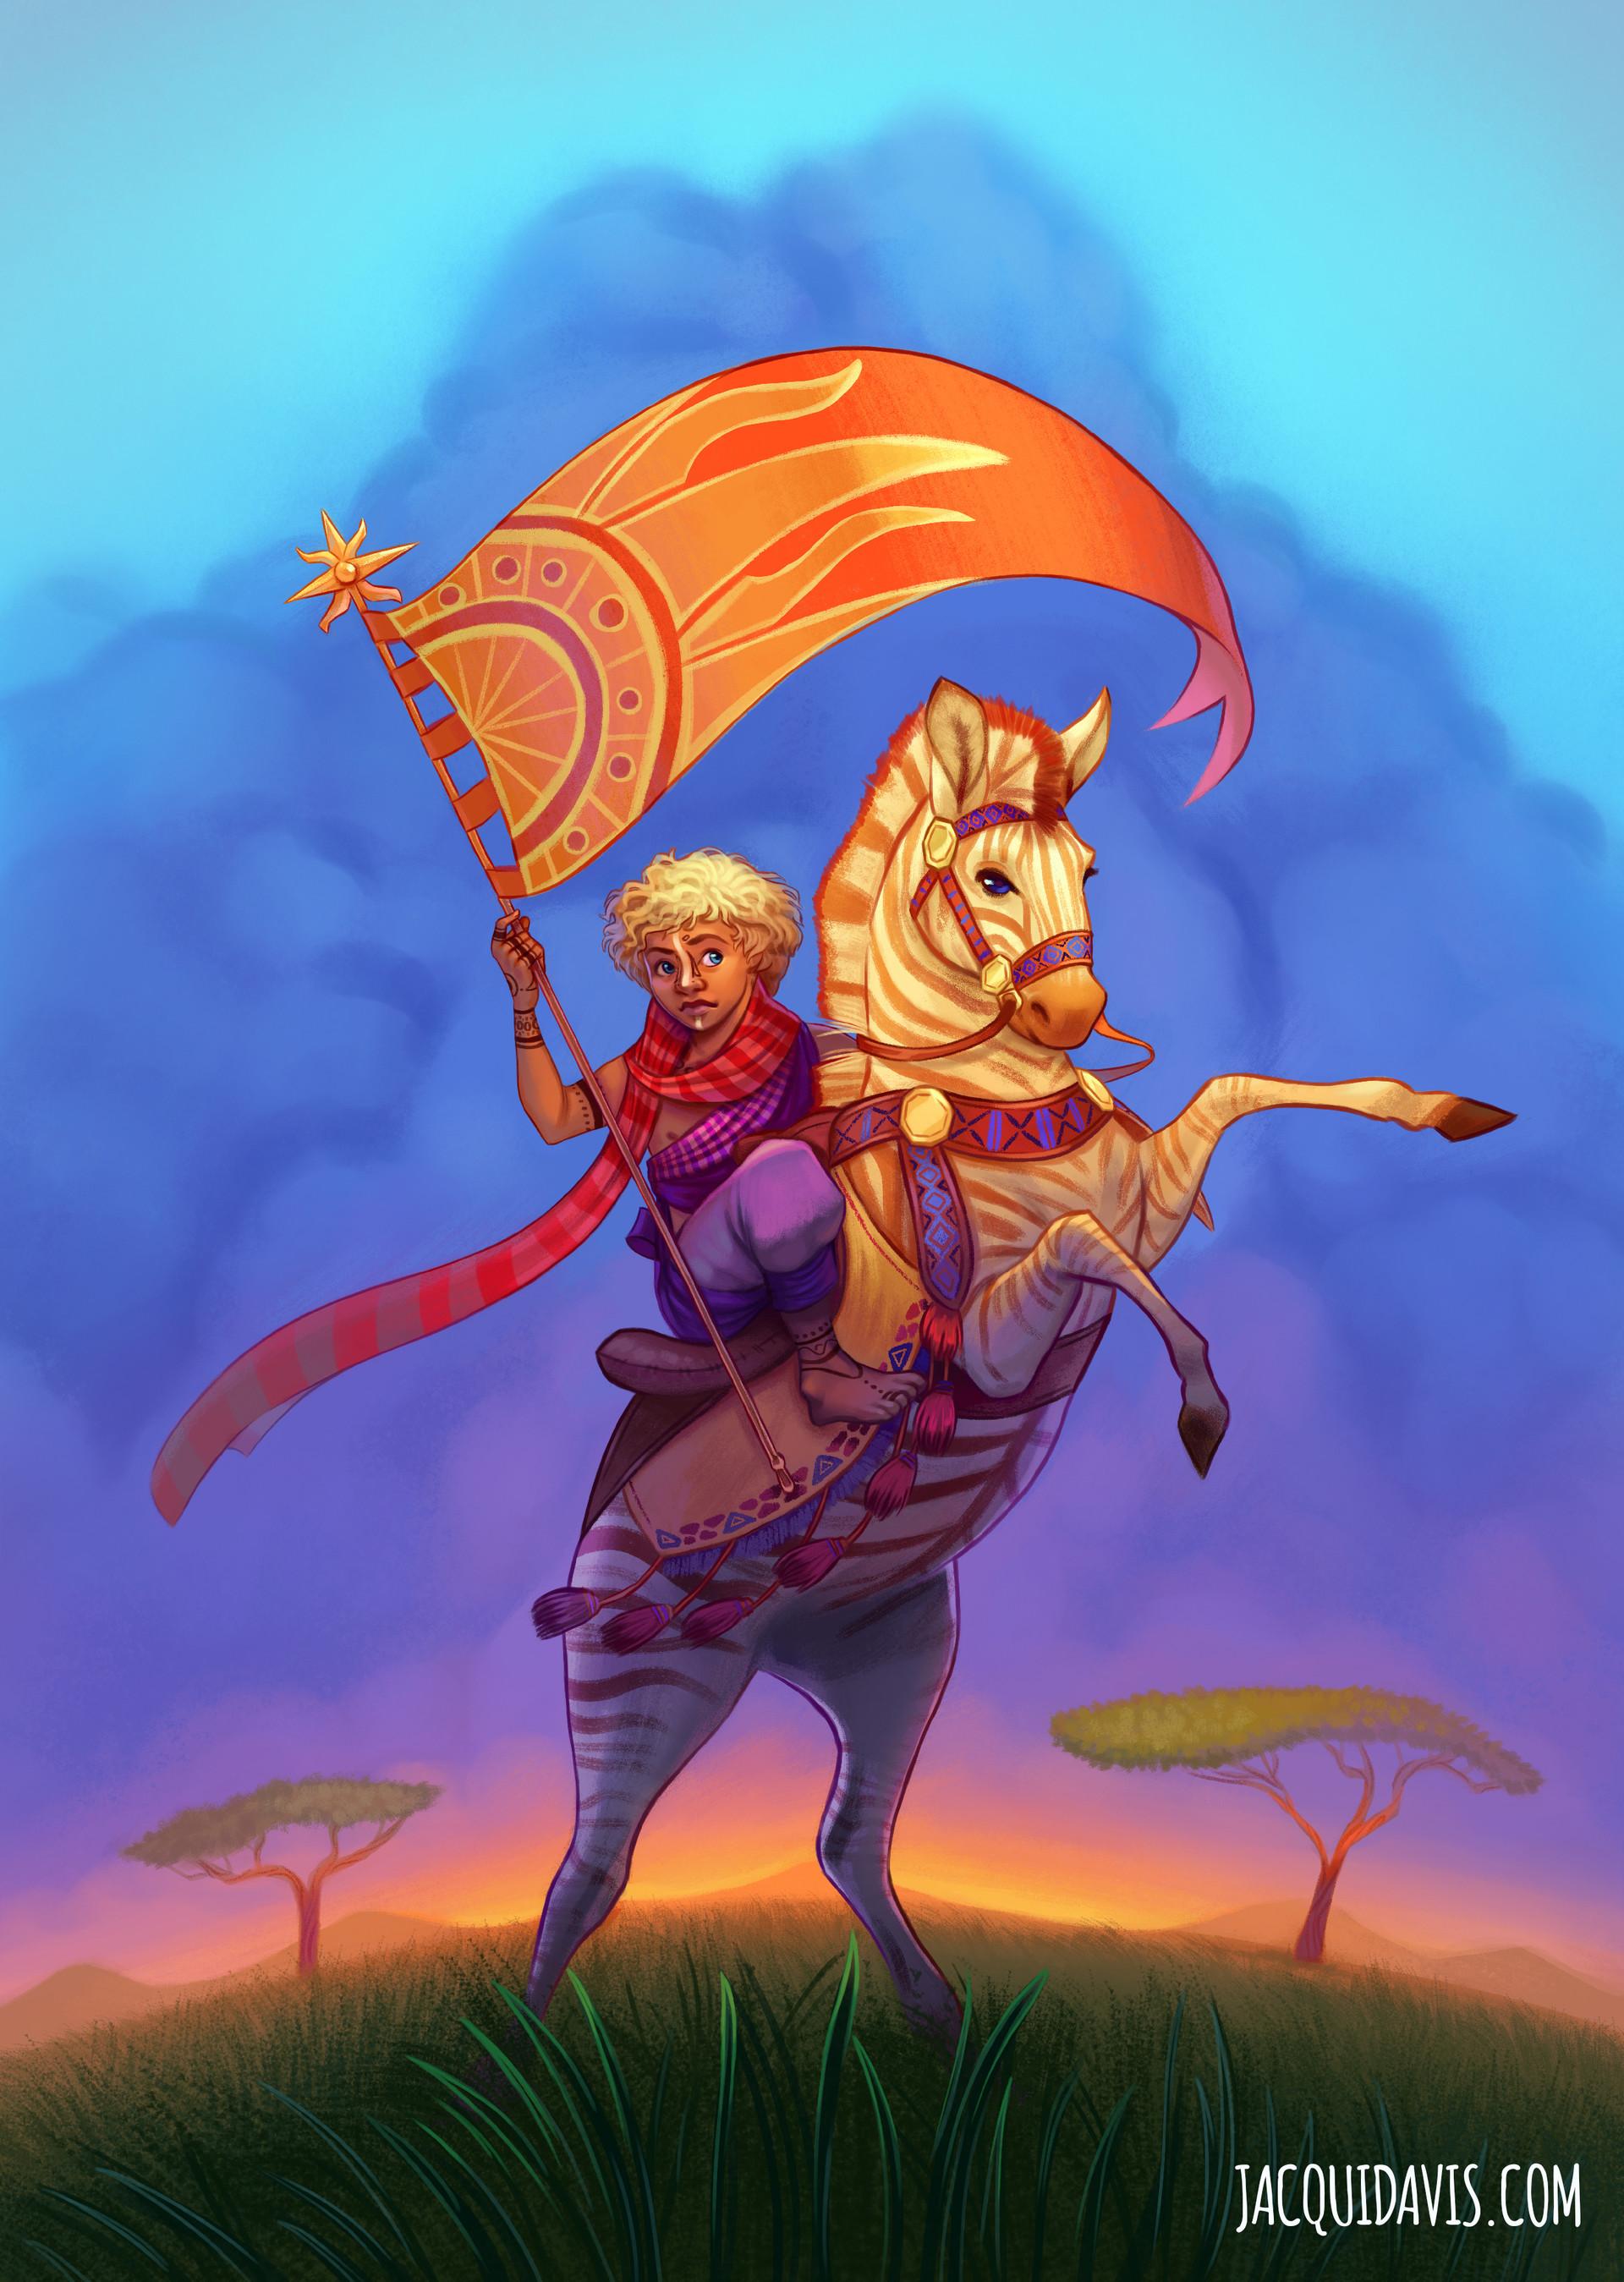 Jacqui davis jacquidavis fantasy prince zebra traditional